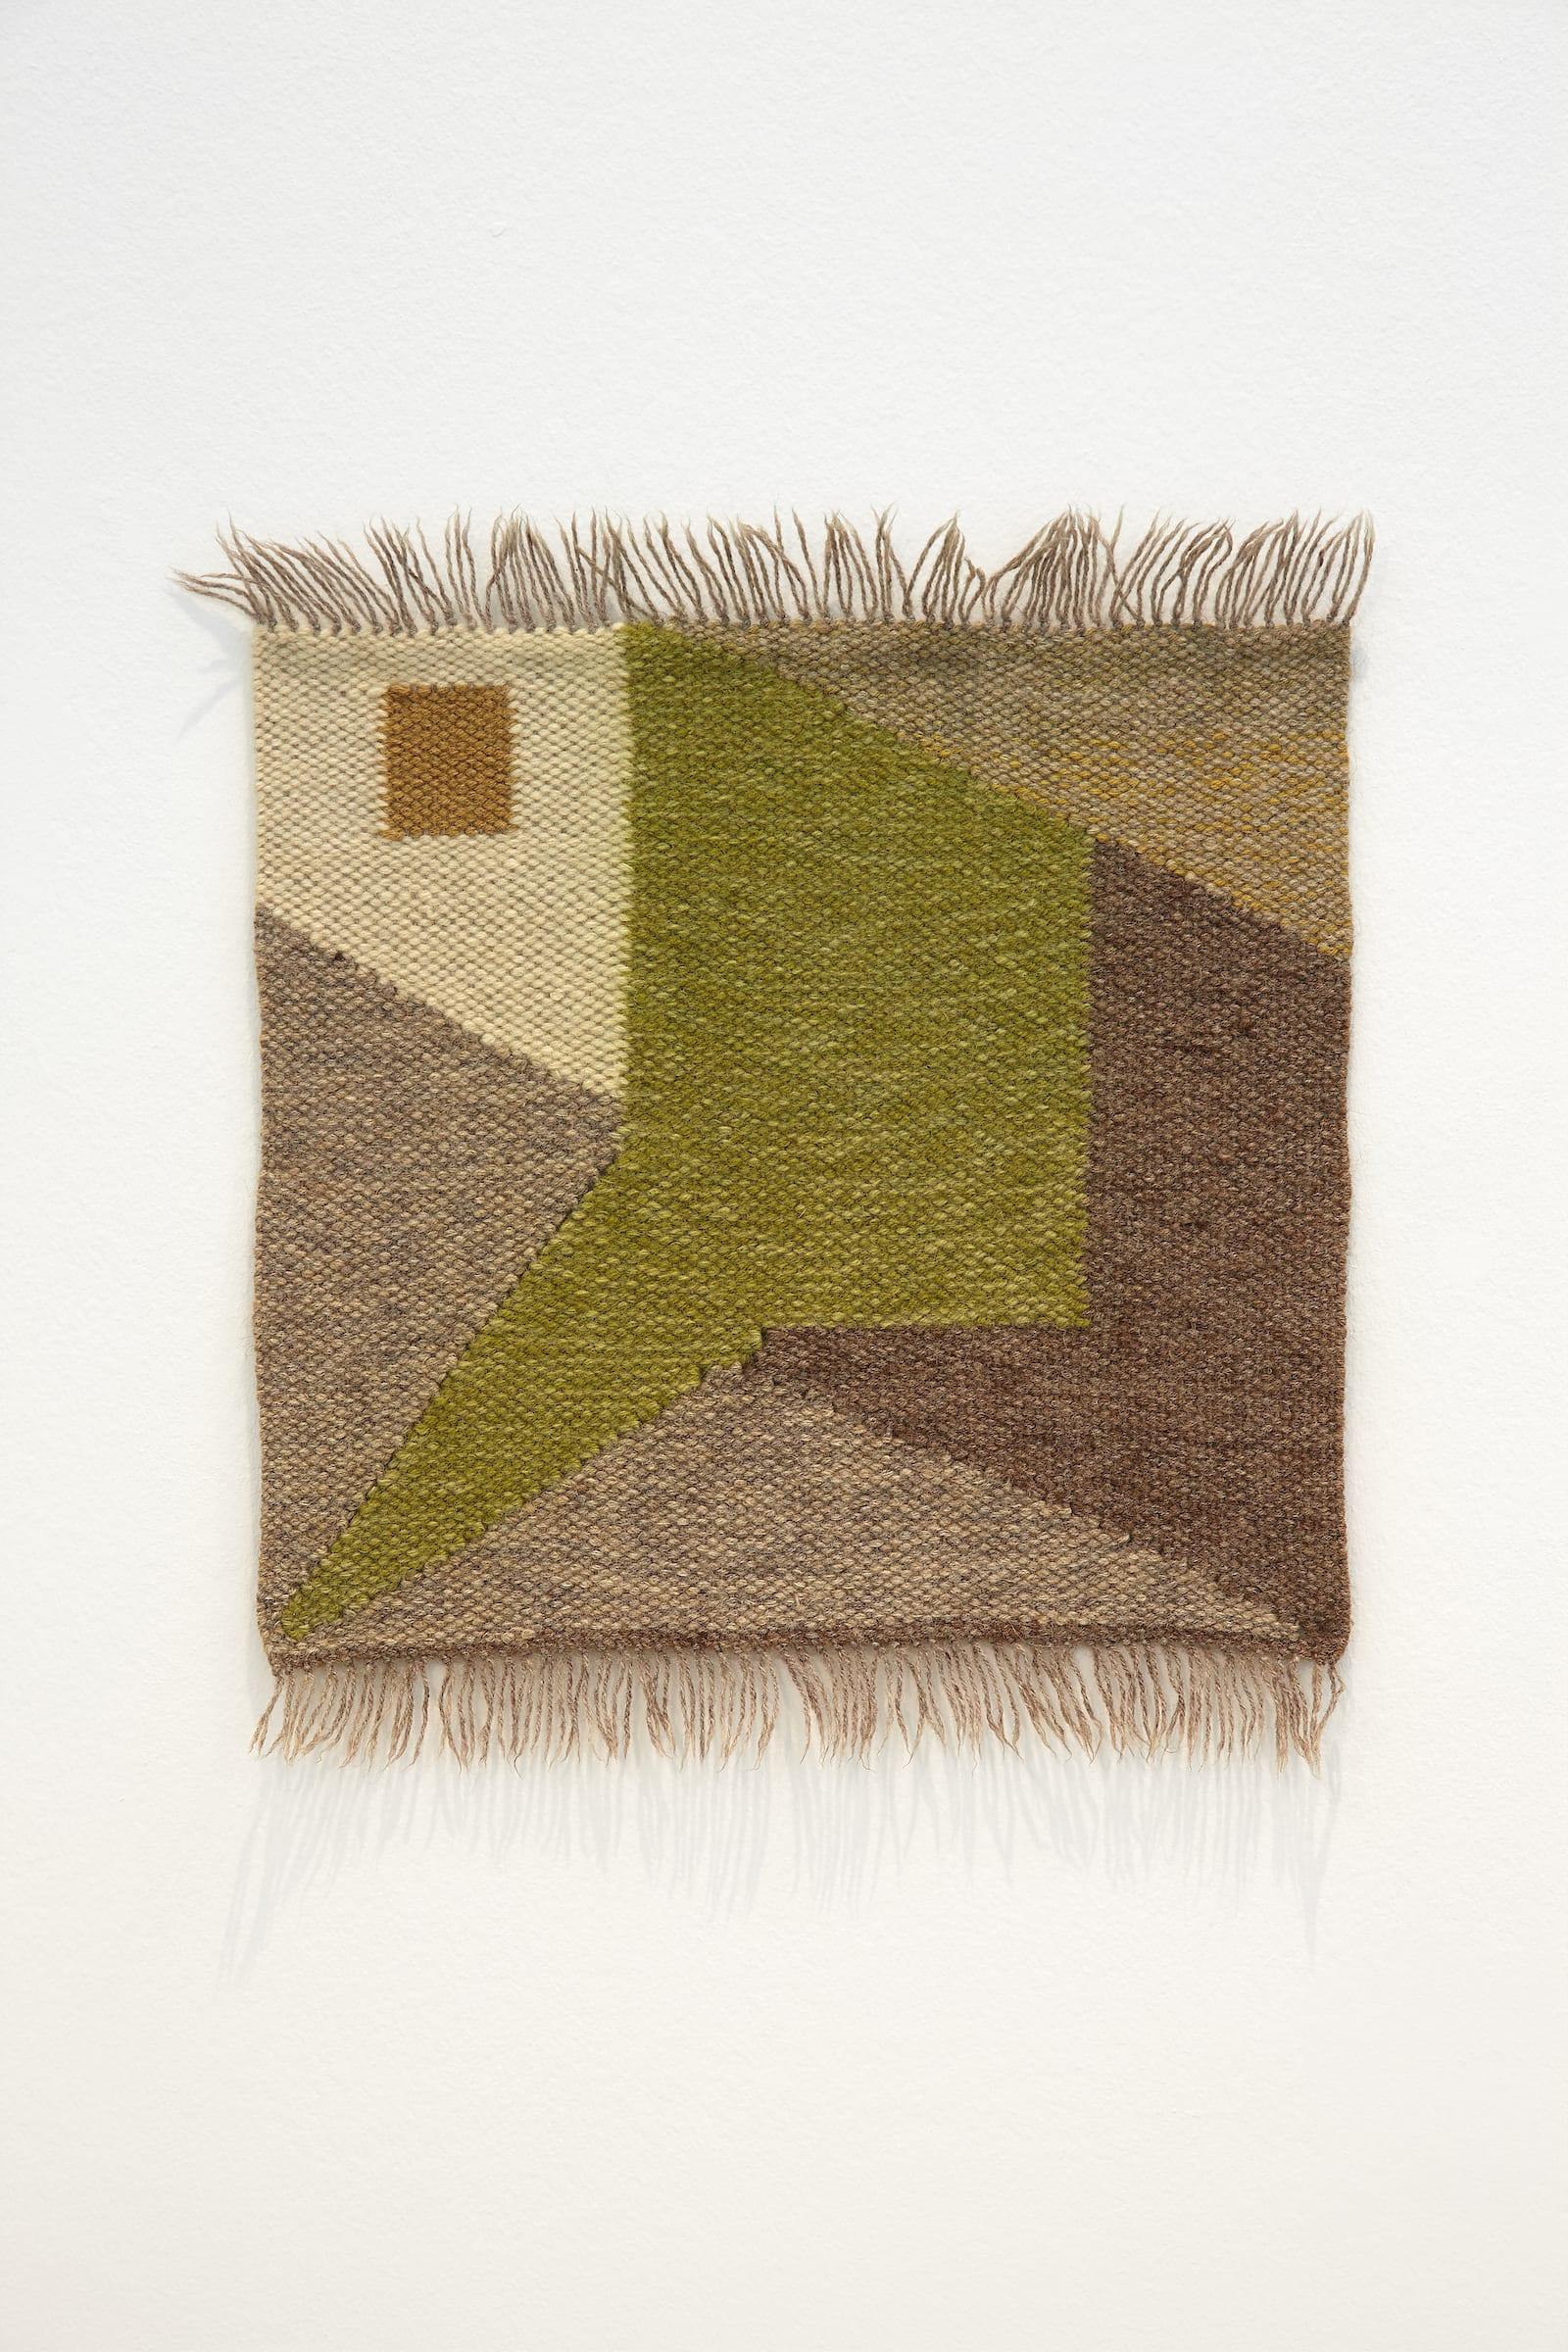 "<span class=""link fancybox-details-link""><a href=""/exhibitions/171/works/artworks16148/"">View Detail Page</a></span><div class=""artist""><strong>Júlíana Sveinsdóttir</strong></div><div class=""title""><em>Untitled</em>, 1957</div><div class=""medium"">wool</div><div class=""dimensions"">54 x 47 cm</div>"